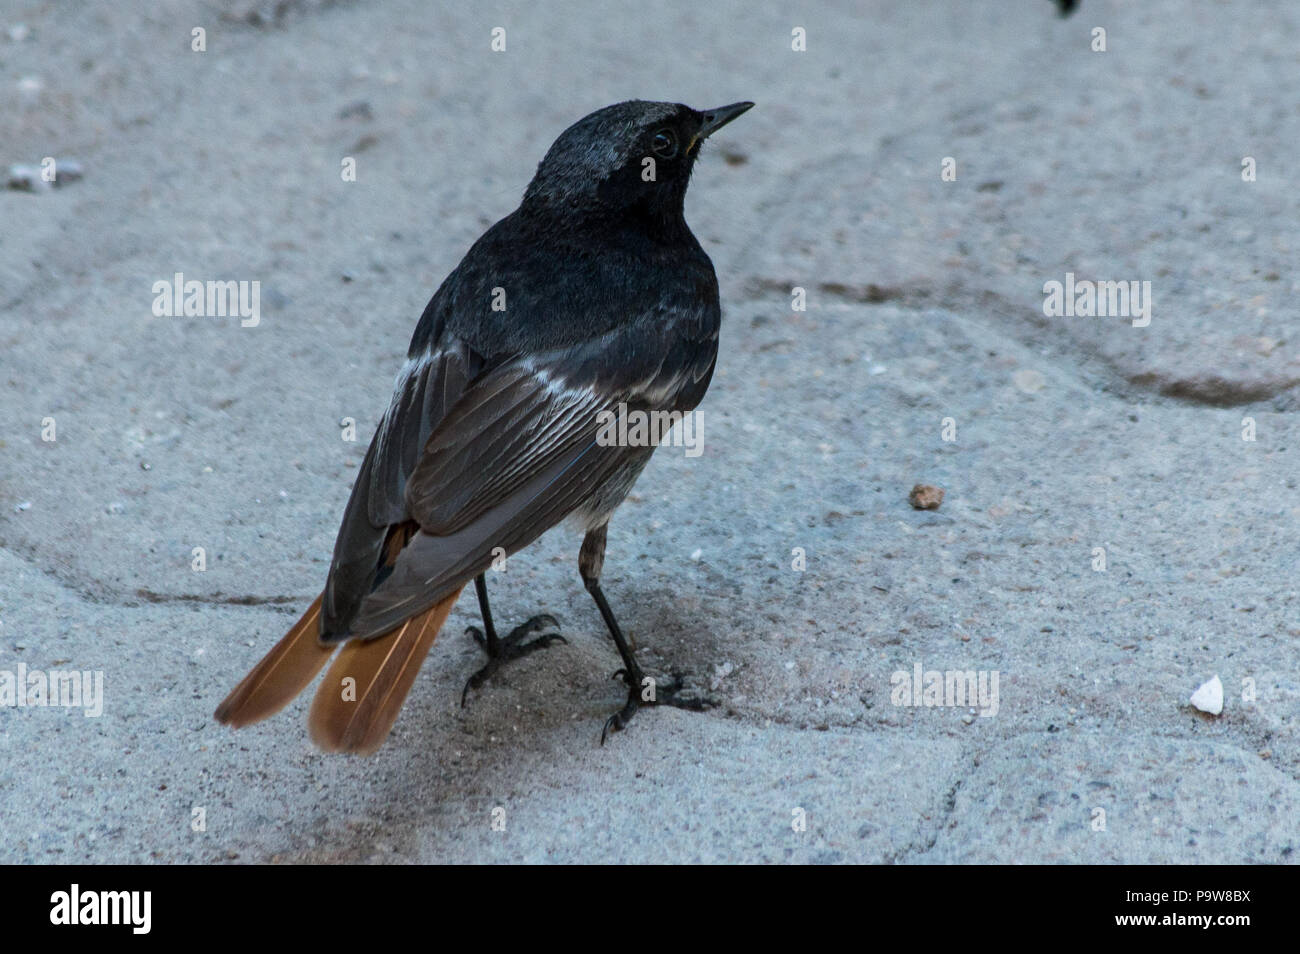 Black redstart photographated in Italy, Piedmont. Un codirosso spazzacamino fotografato in Piemonte, Italia. - Stock Image